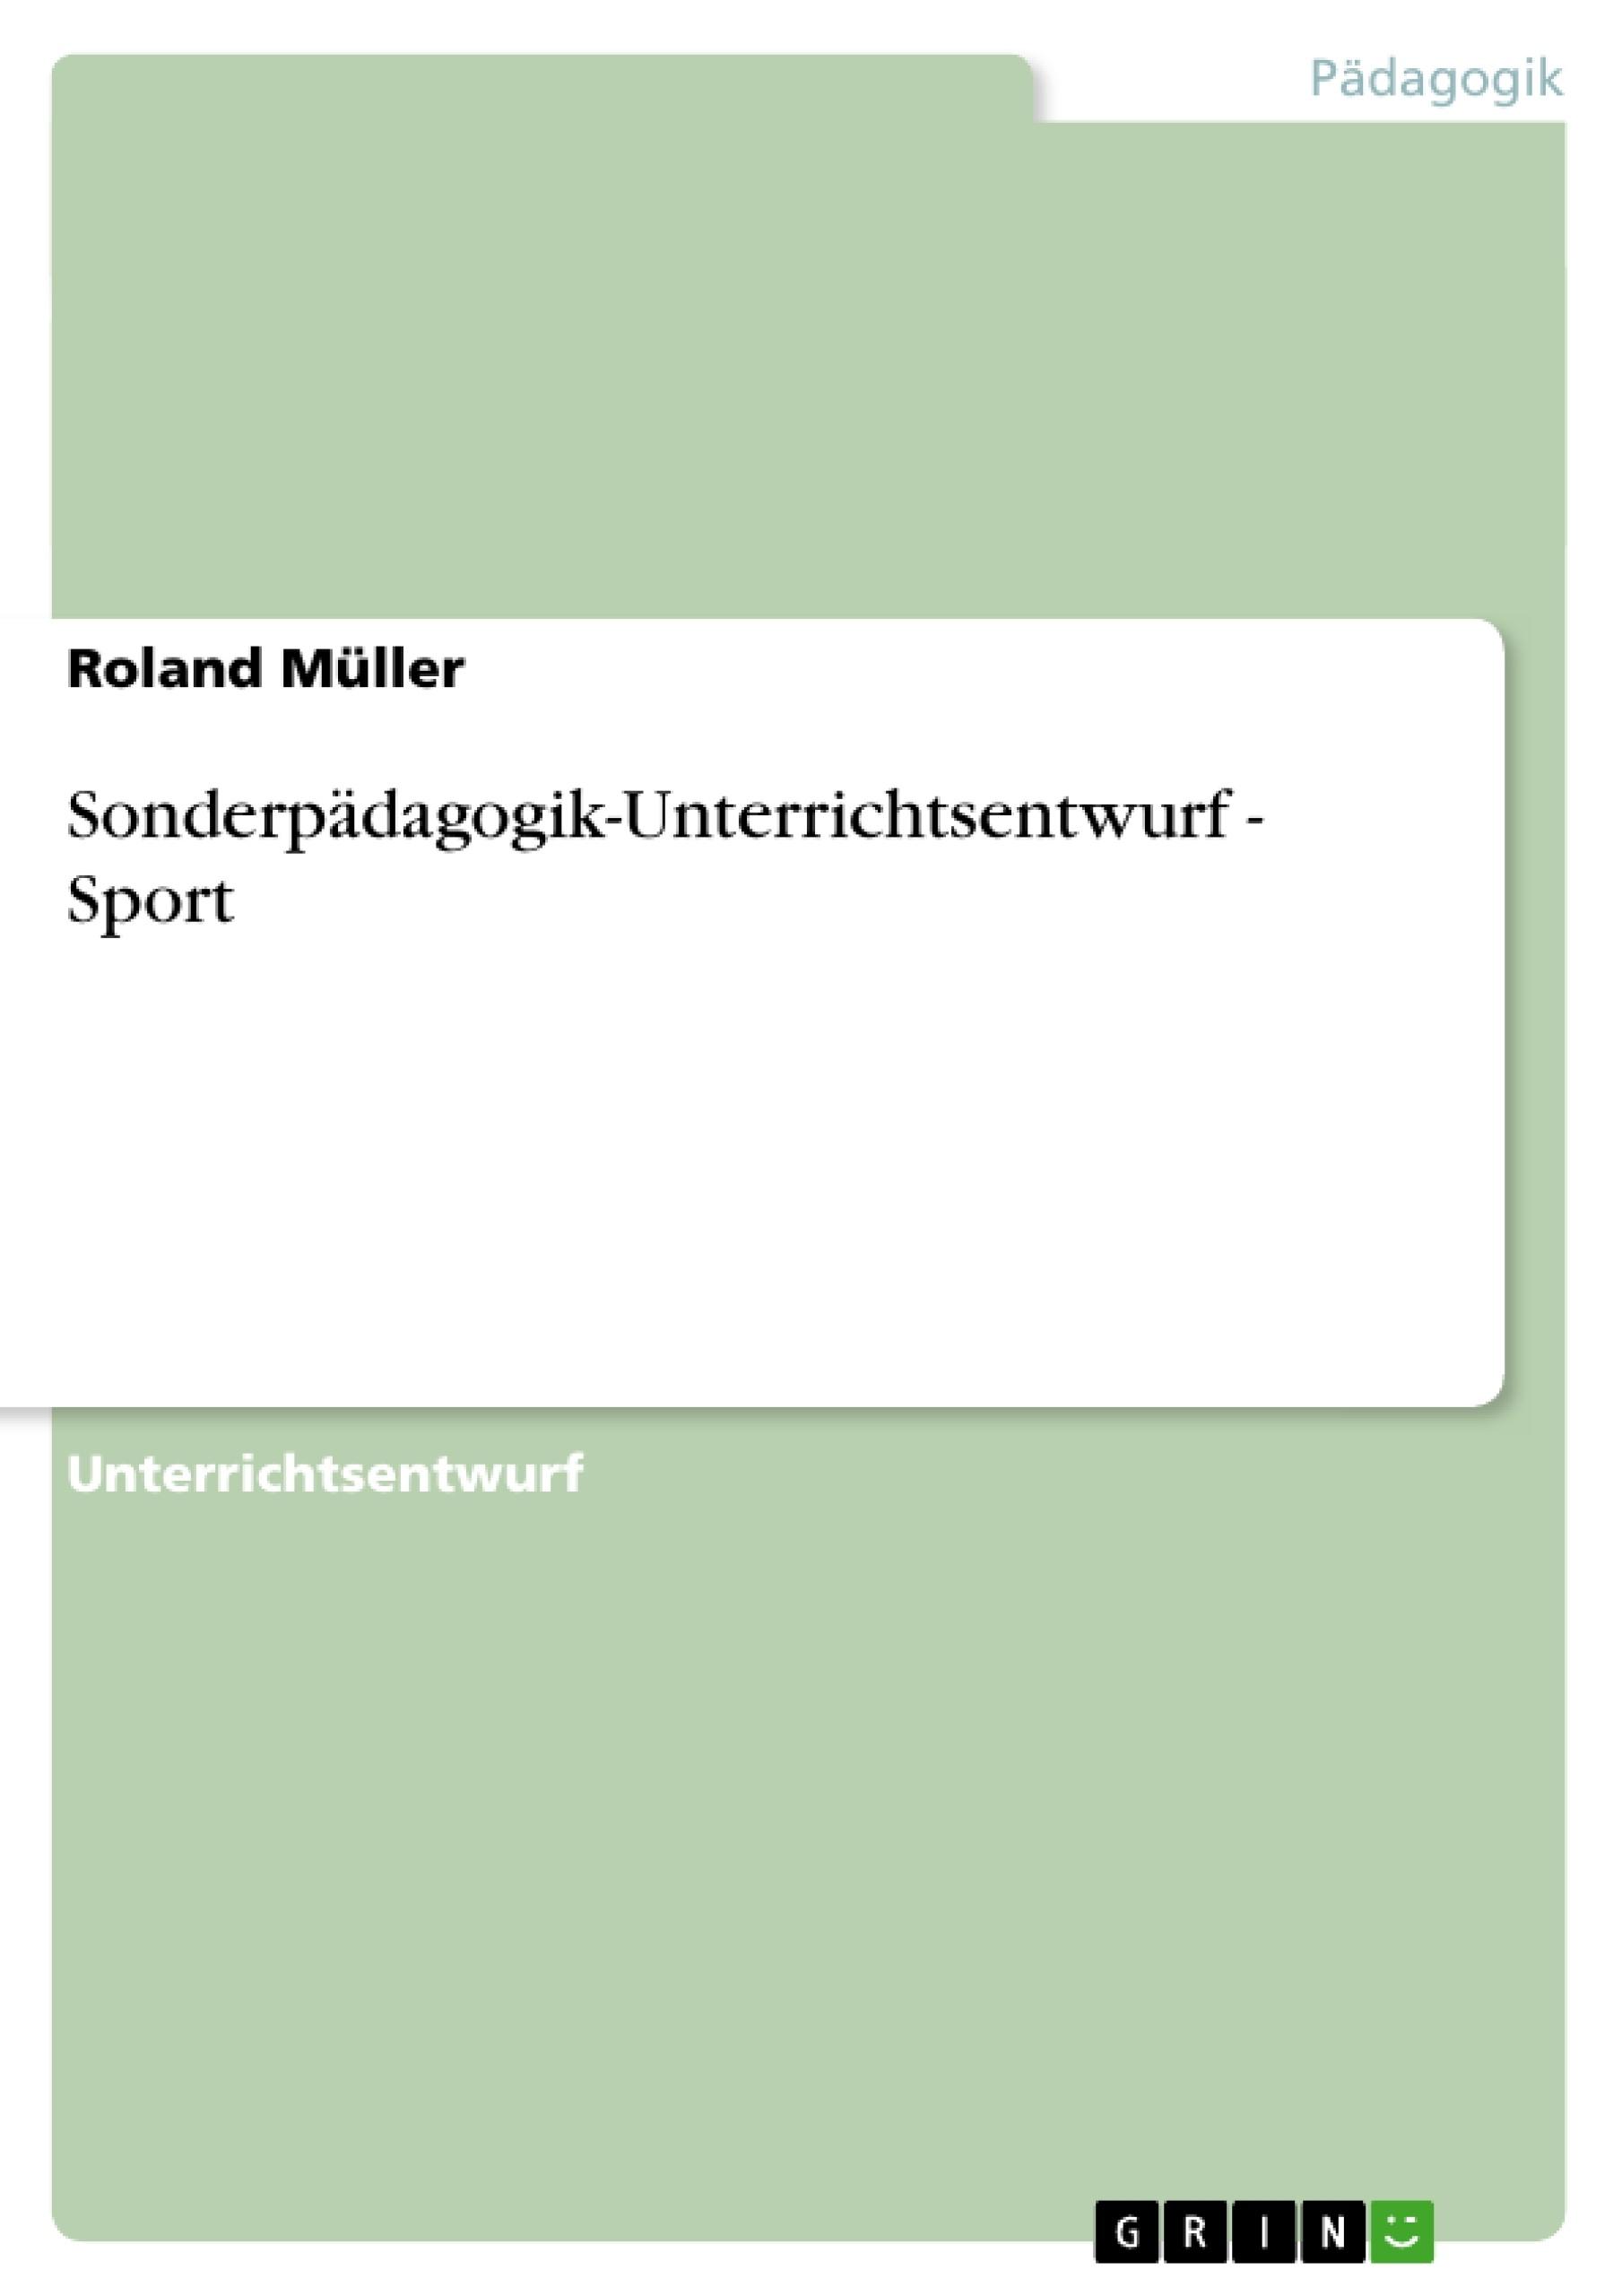 Titel: Sonderpädagogik-Unterrichtsentwurf - Sport